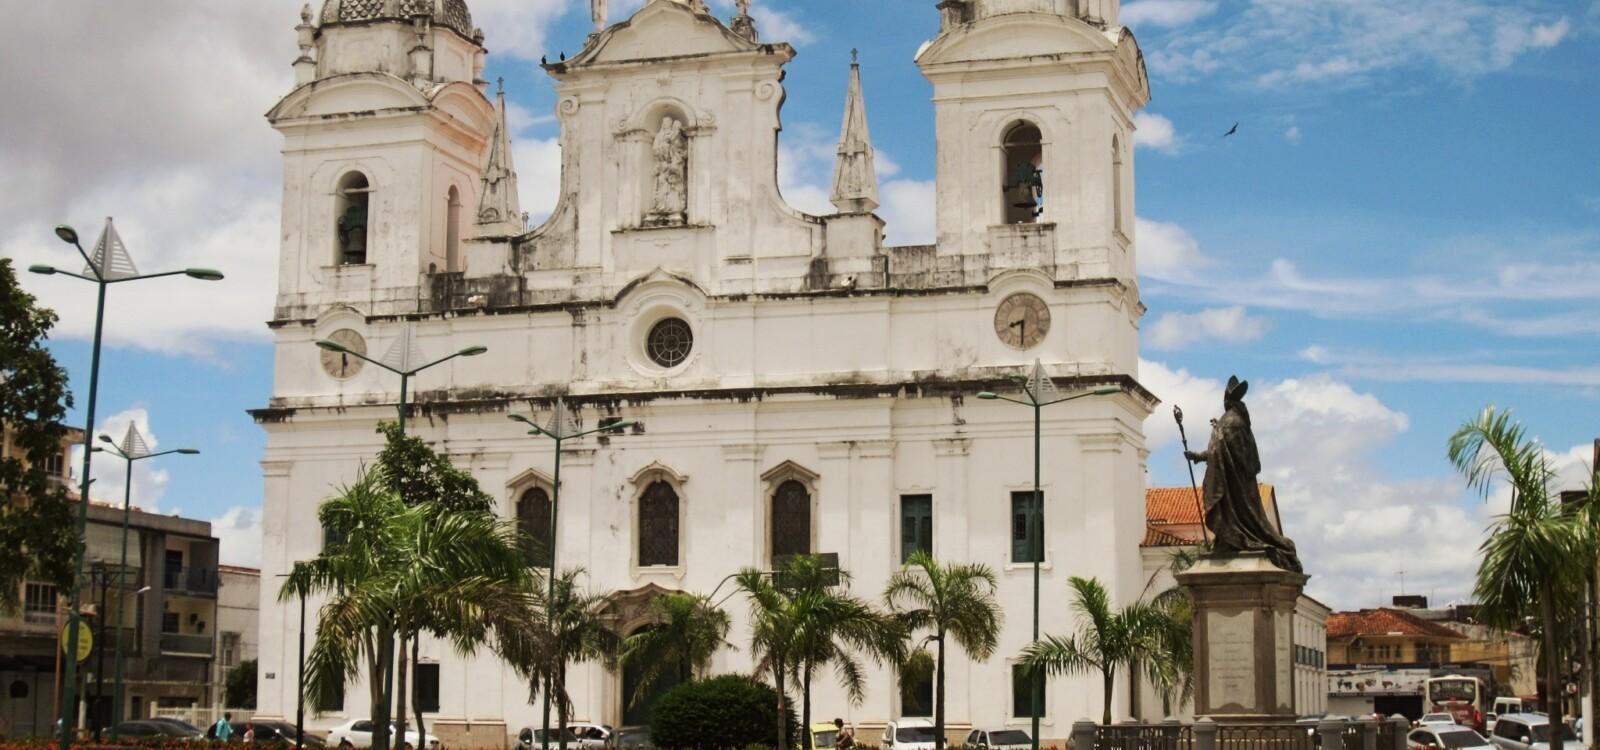 Las mejores zonas donde alojarse en Belém, Brasil